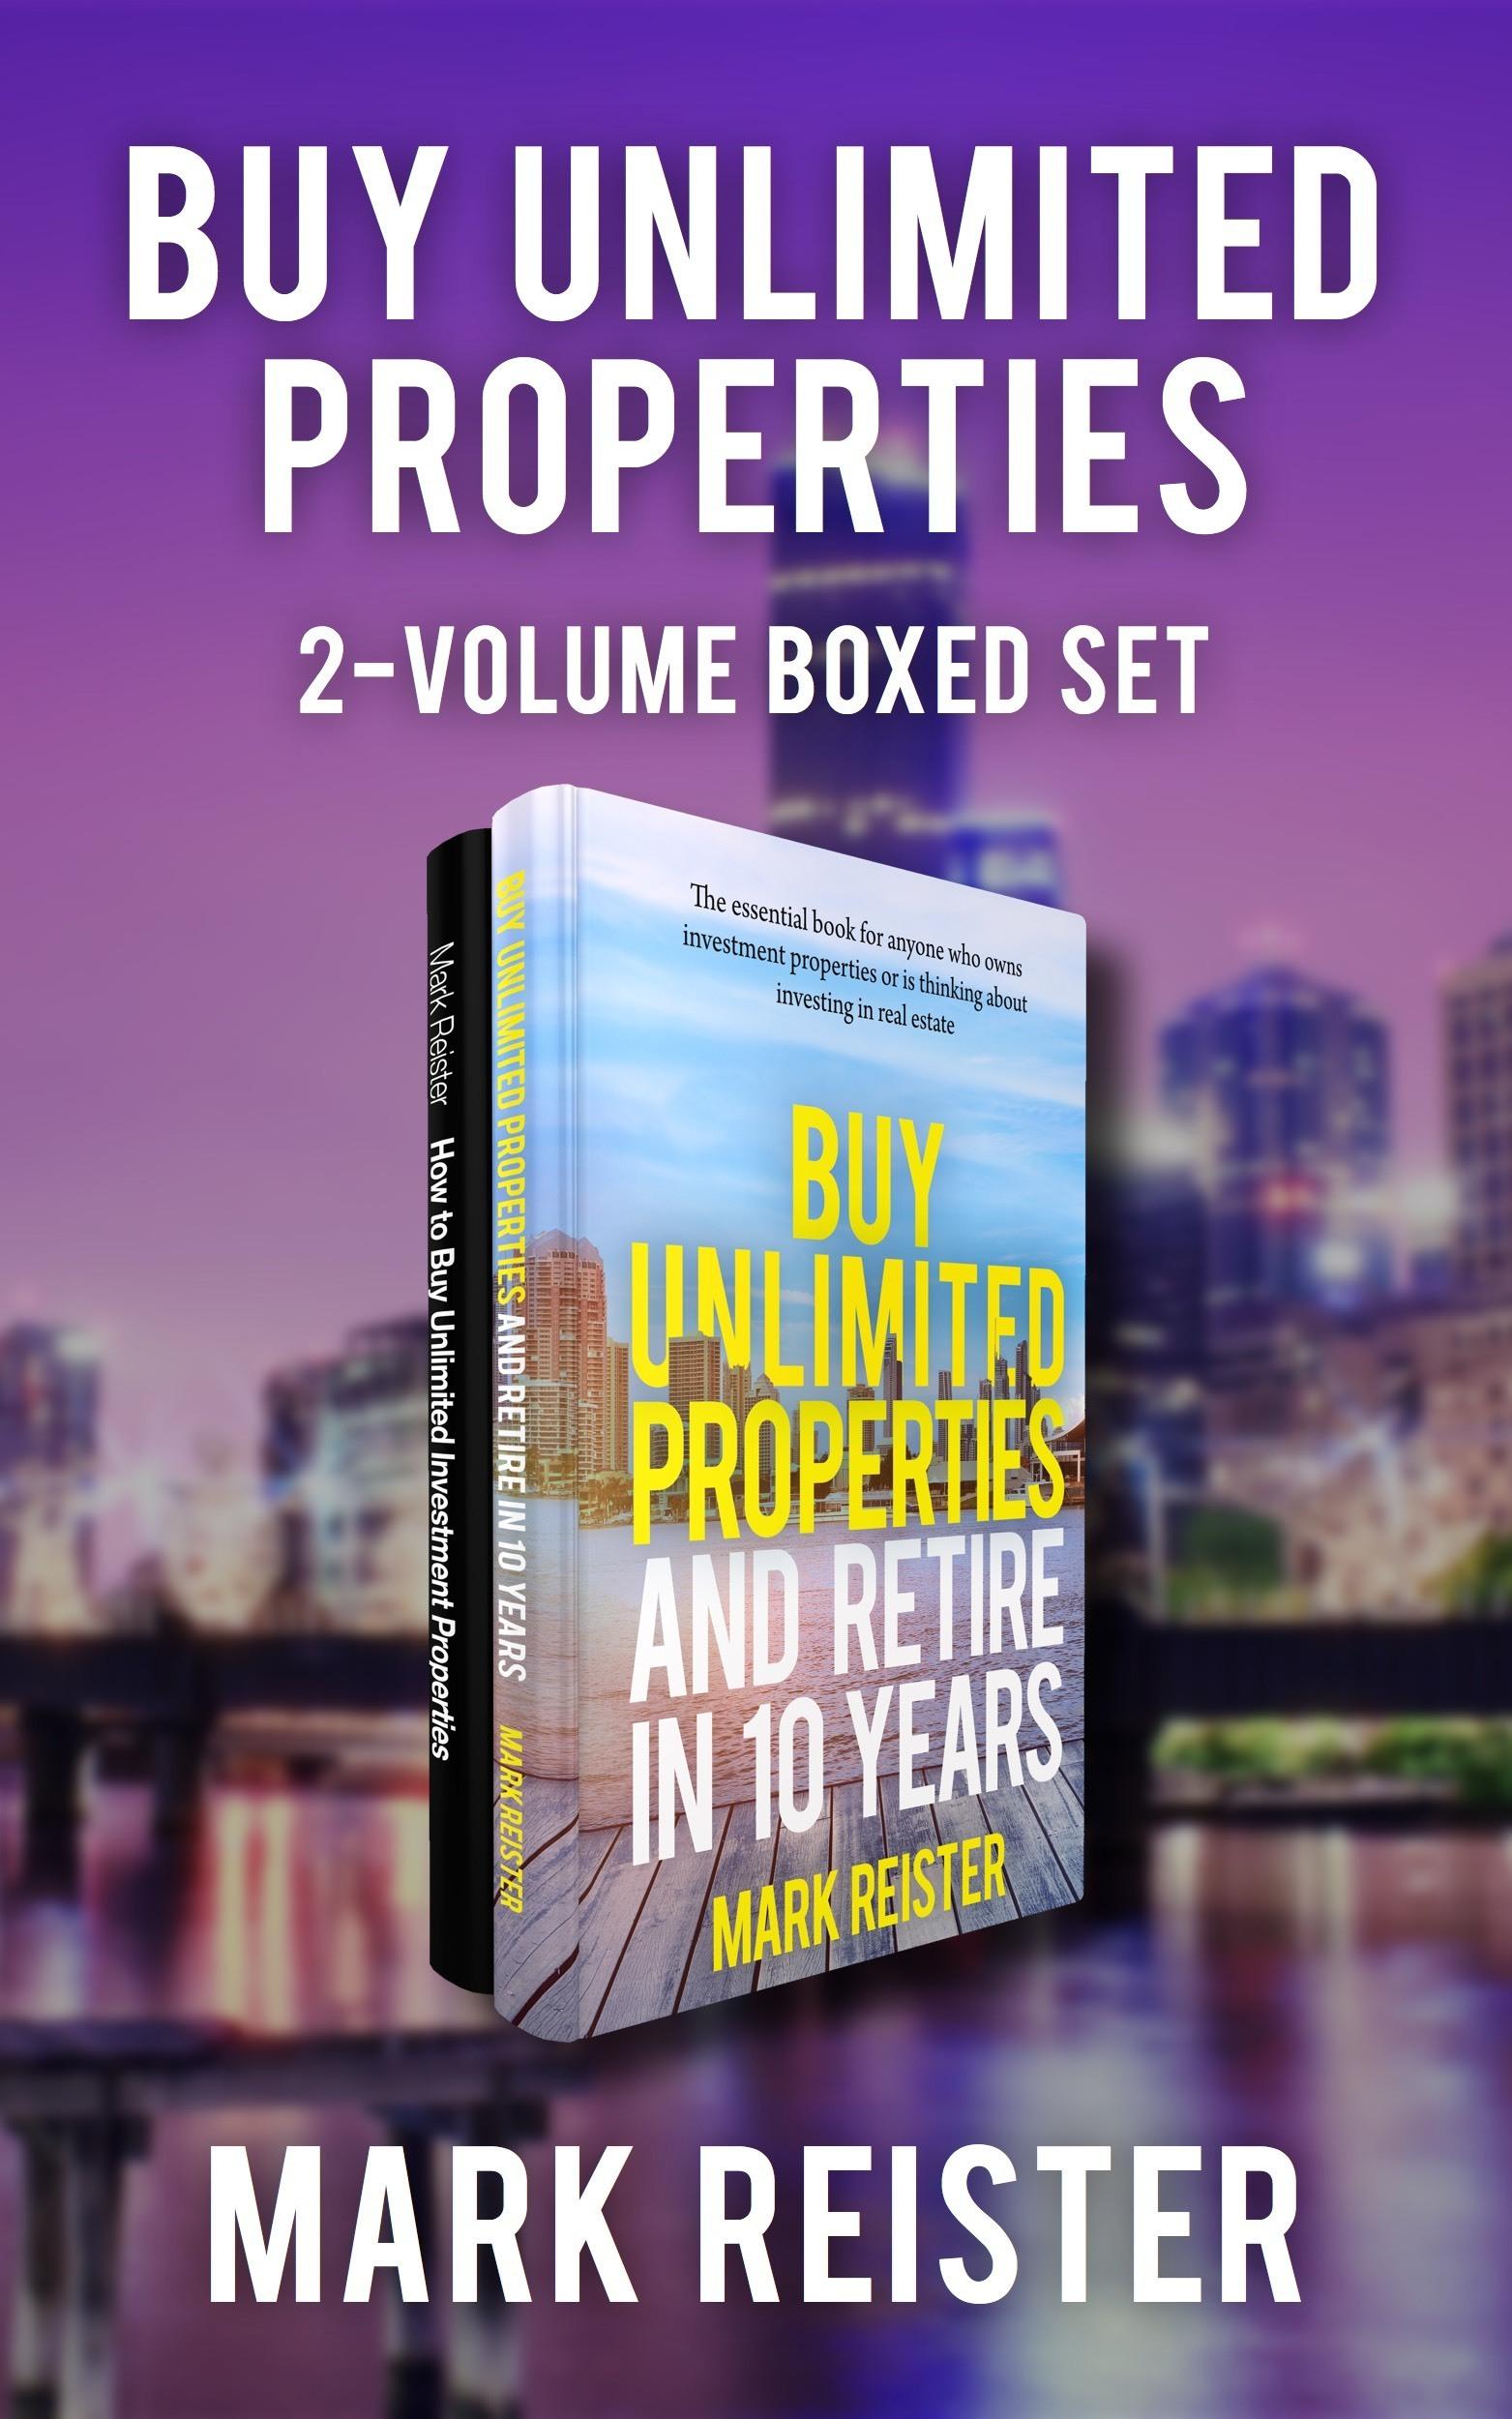 Buy Unlimited Properties 2-Volume Boxed Set Mark Reister